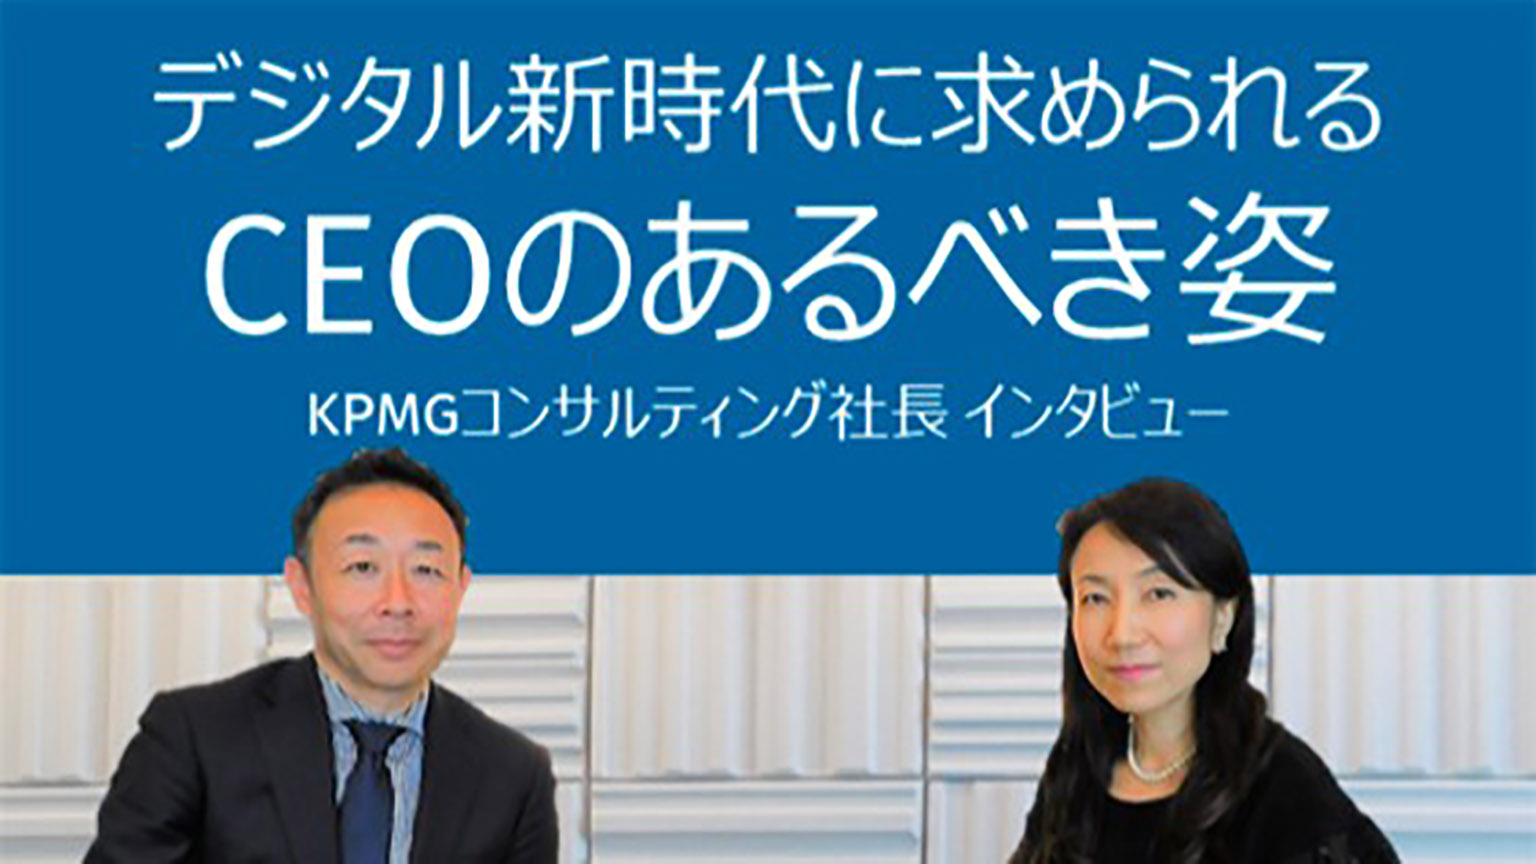 Image JP